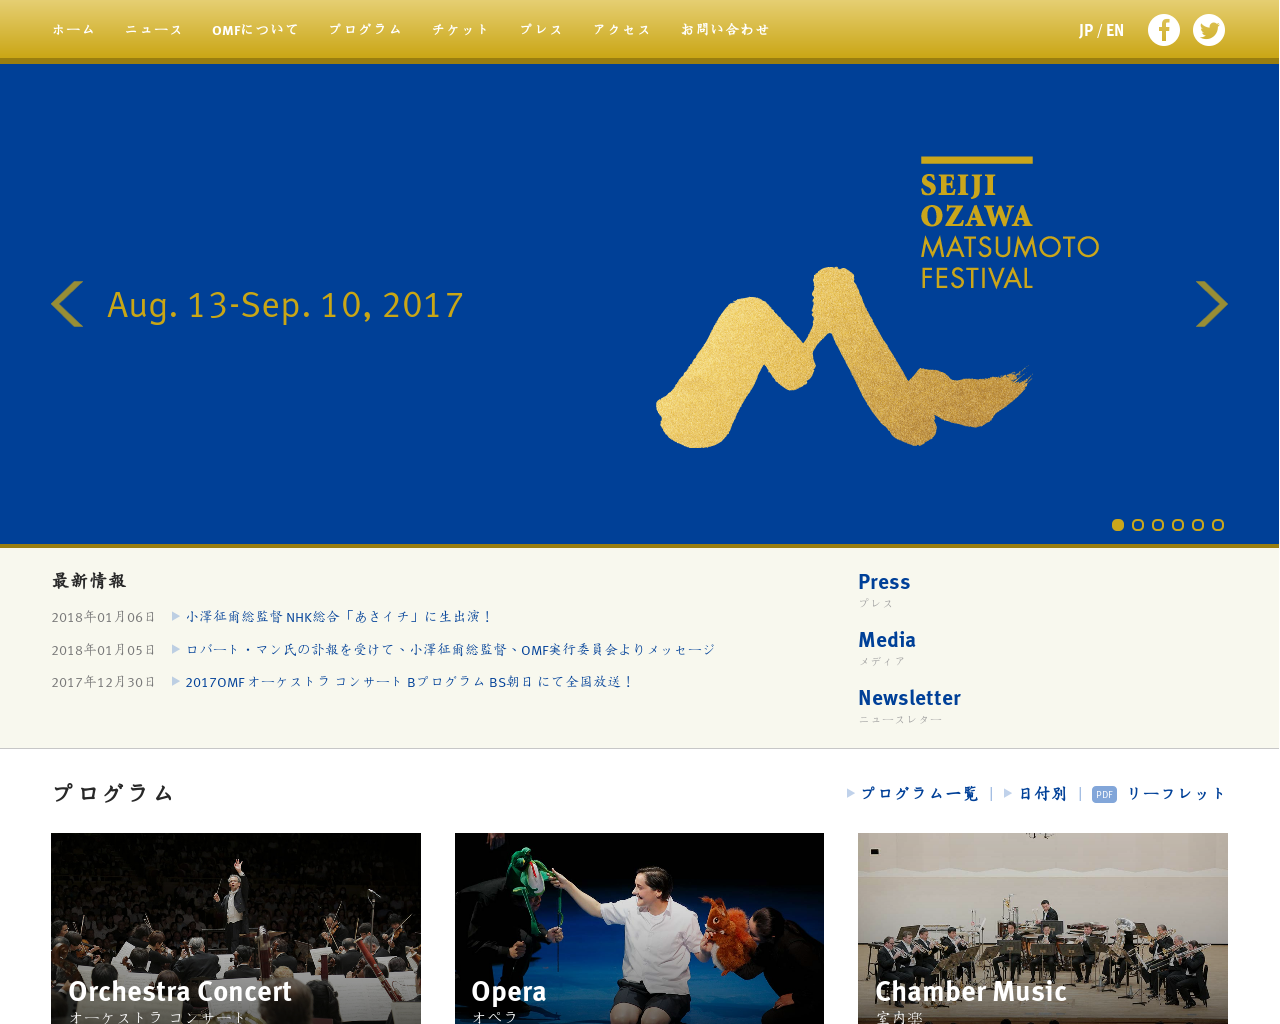 www.ozawa-festival.com(2018/01/12 13:40:41)